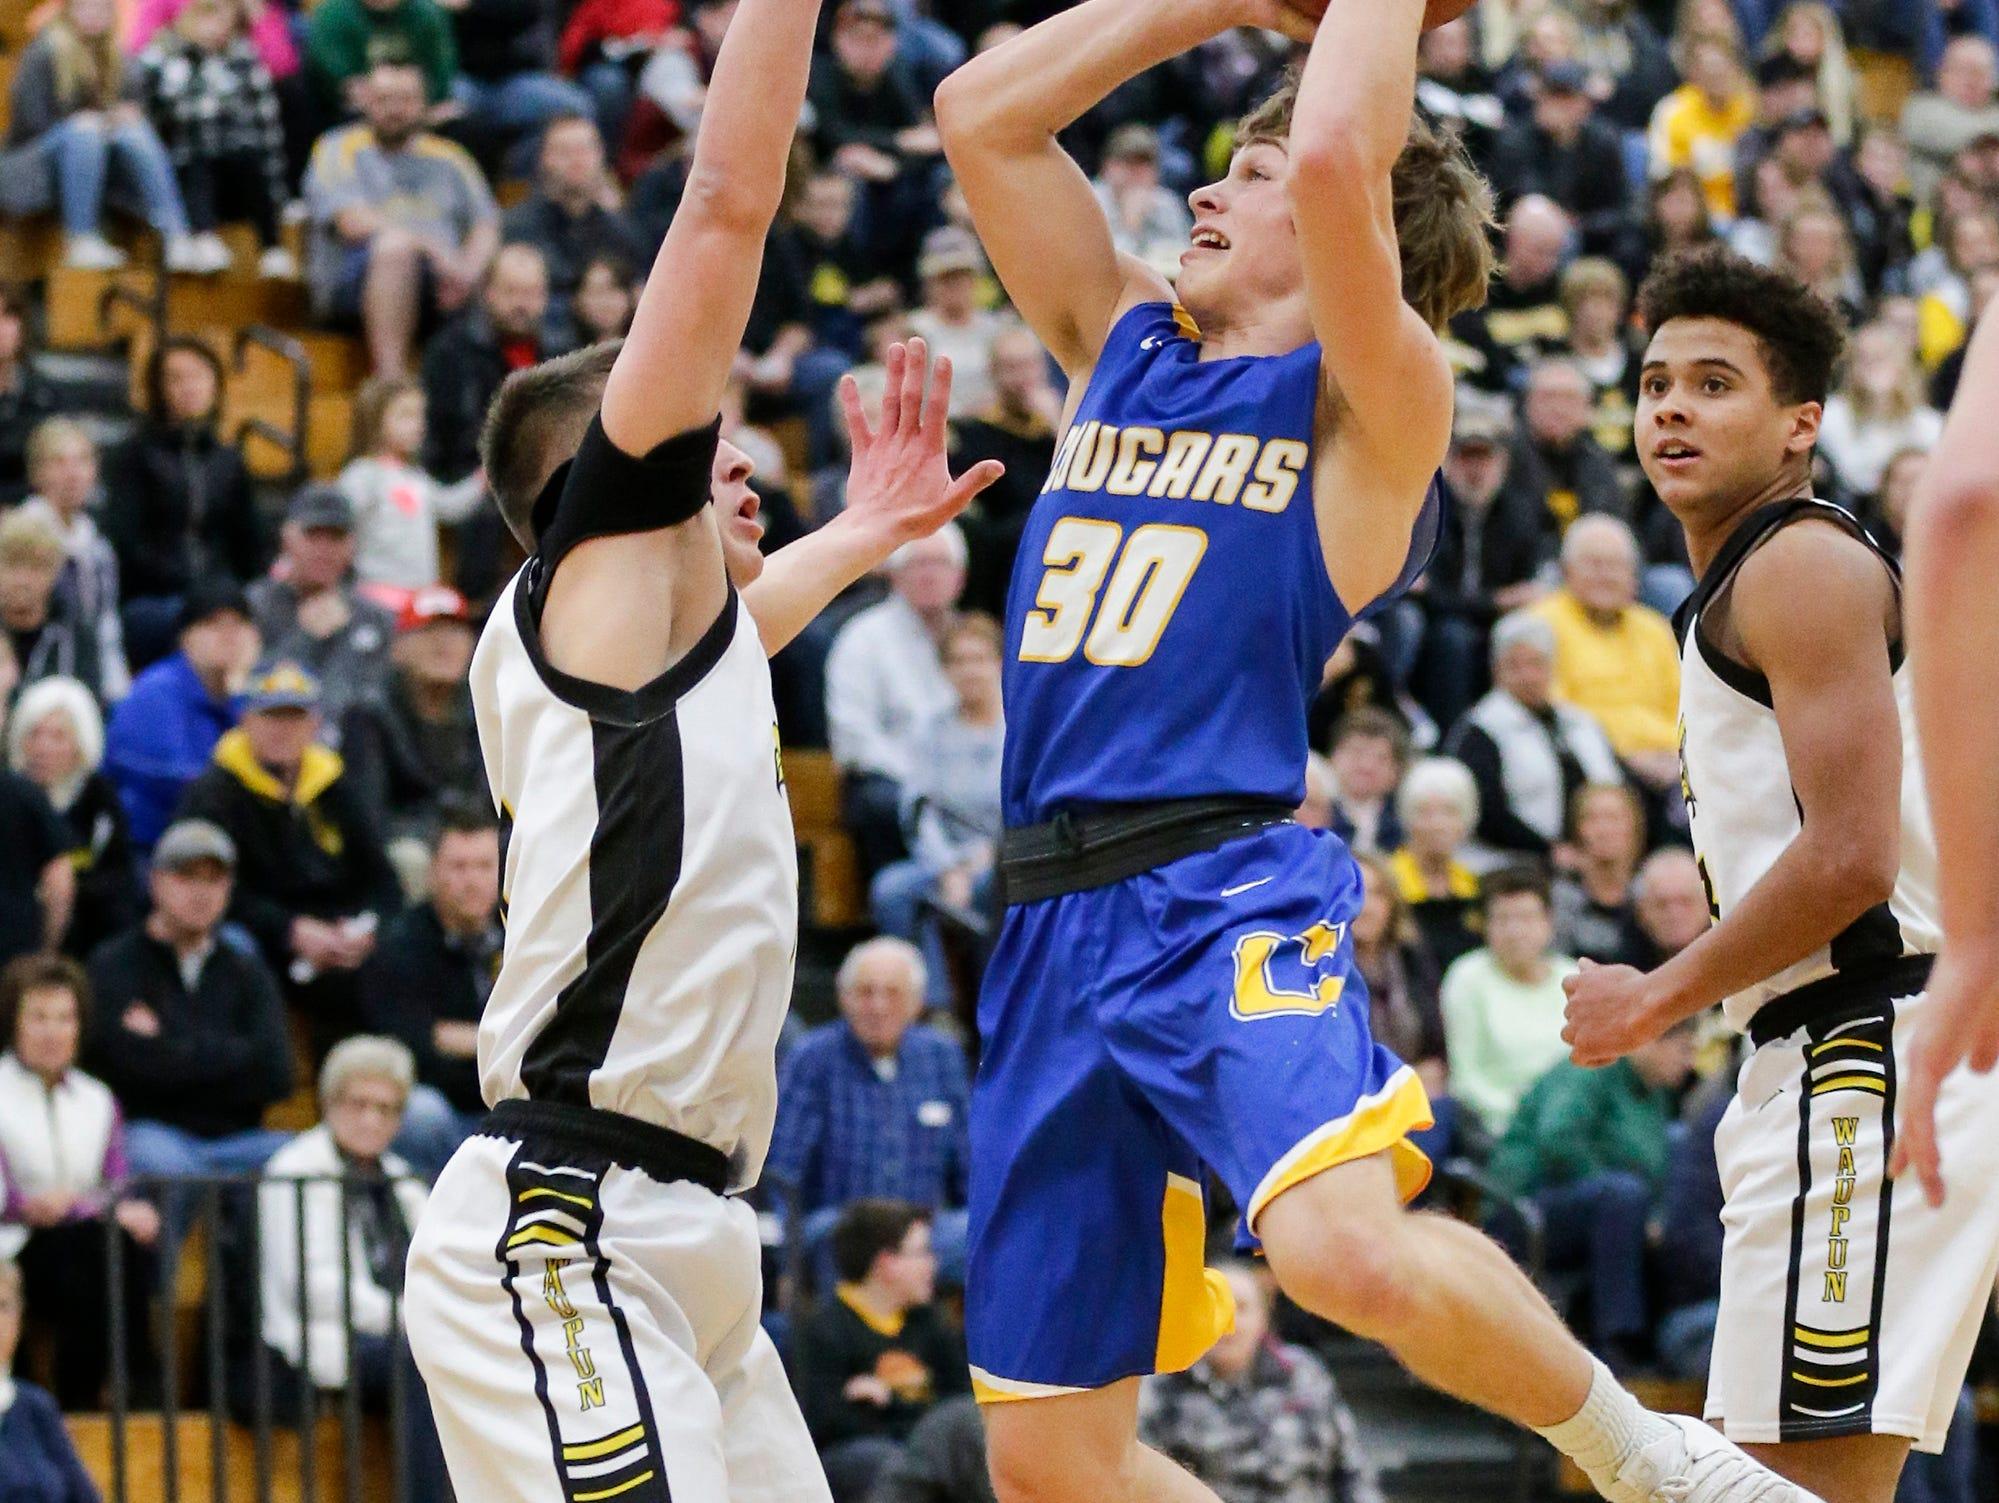 Campbellsport High School boys basketball's Jacob Johnson attempts to shoot a basket over Waupun High School's Trevor VandeZande during their game Friday, December 14, 2018 in Waupun. Waupun won the game 64-33. Doug Raflik/USA TODAY NETWORK-Wisconsin